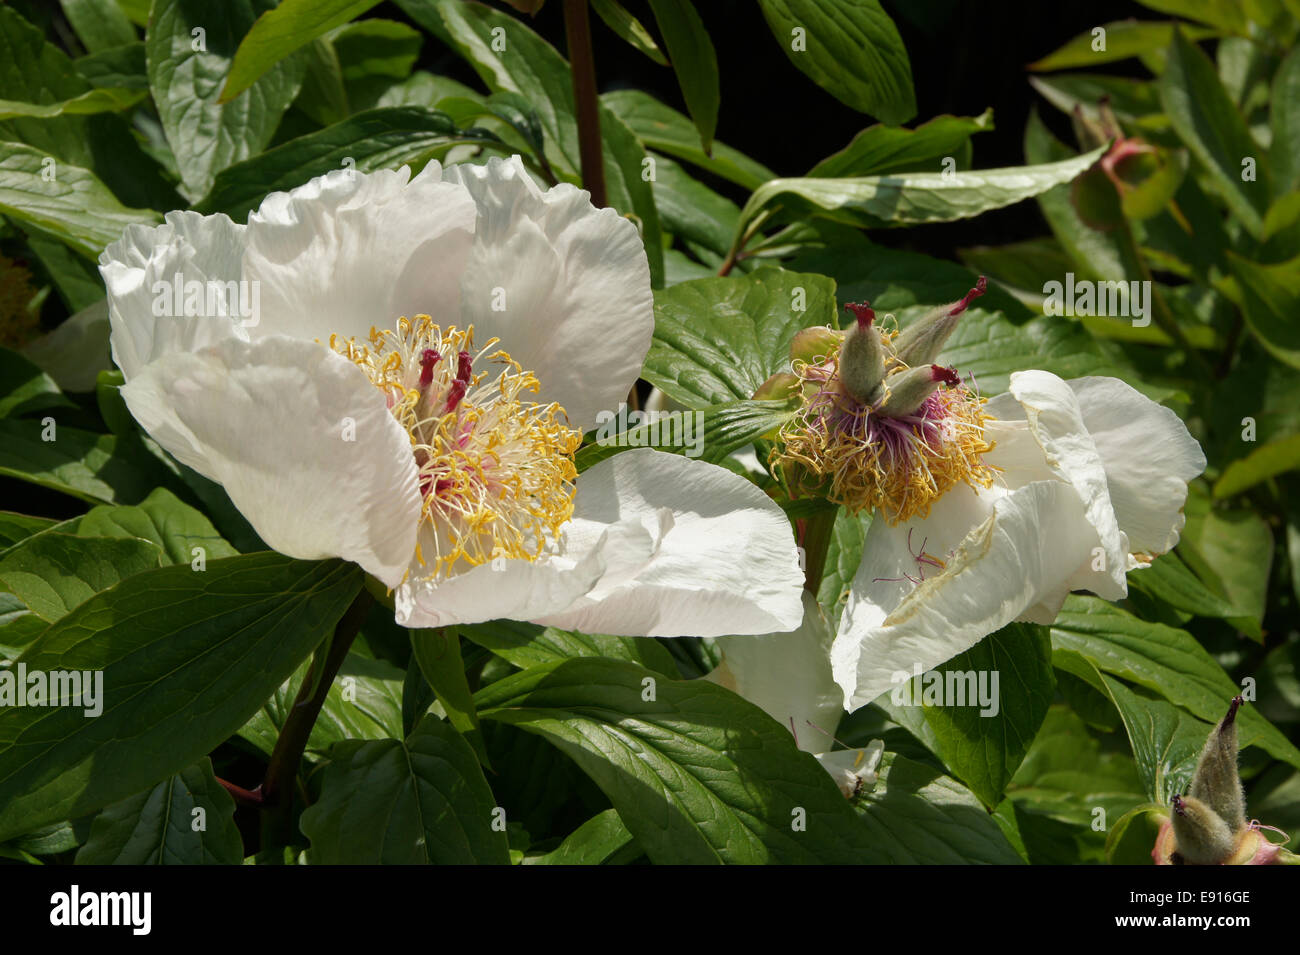 Paeonia Chalice, Prachtpfingstrose, Peony - Stock Image